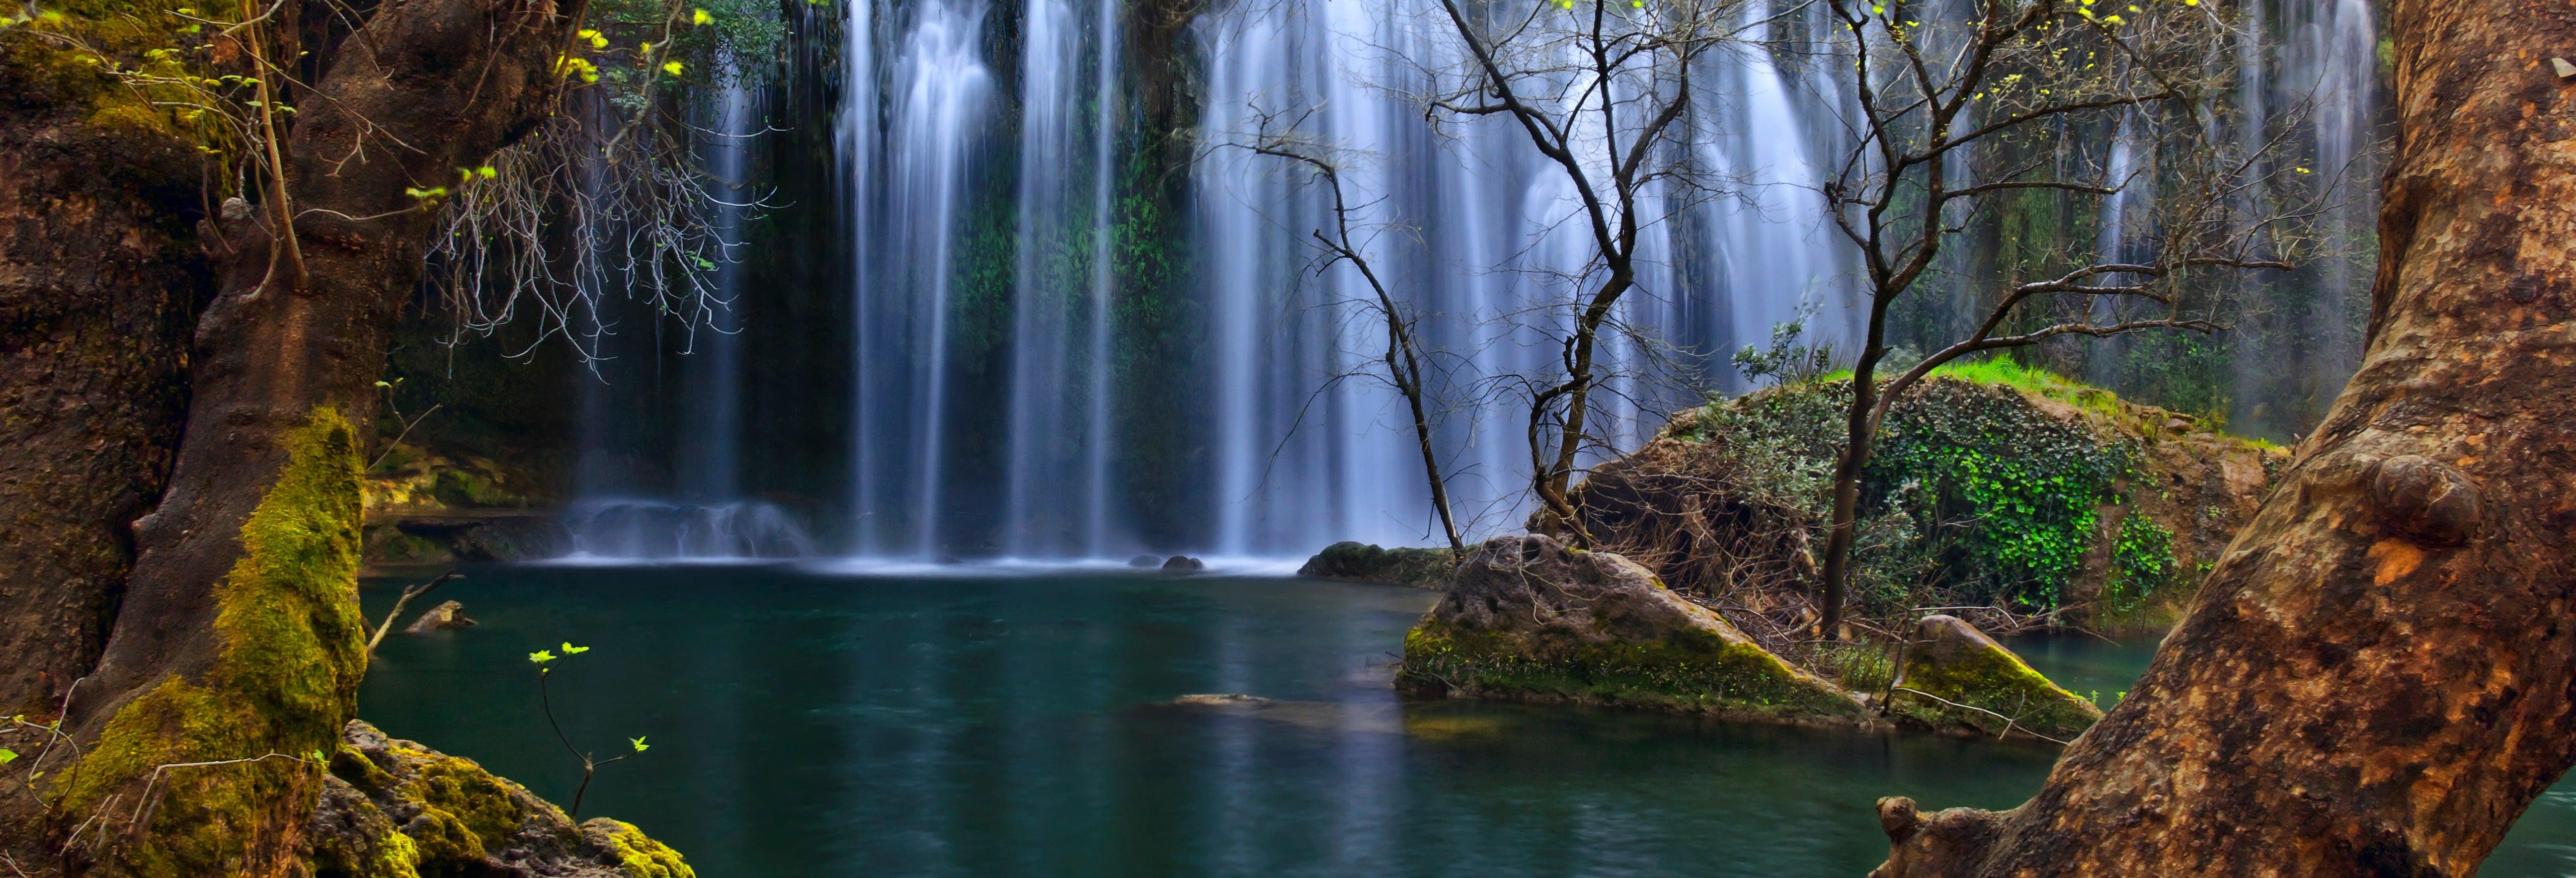 Excursión a las cascadas Düden y Kursunlu